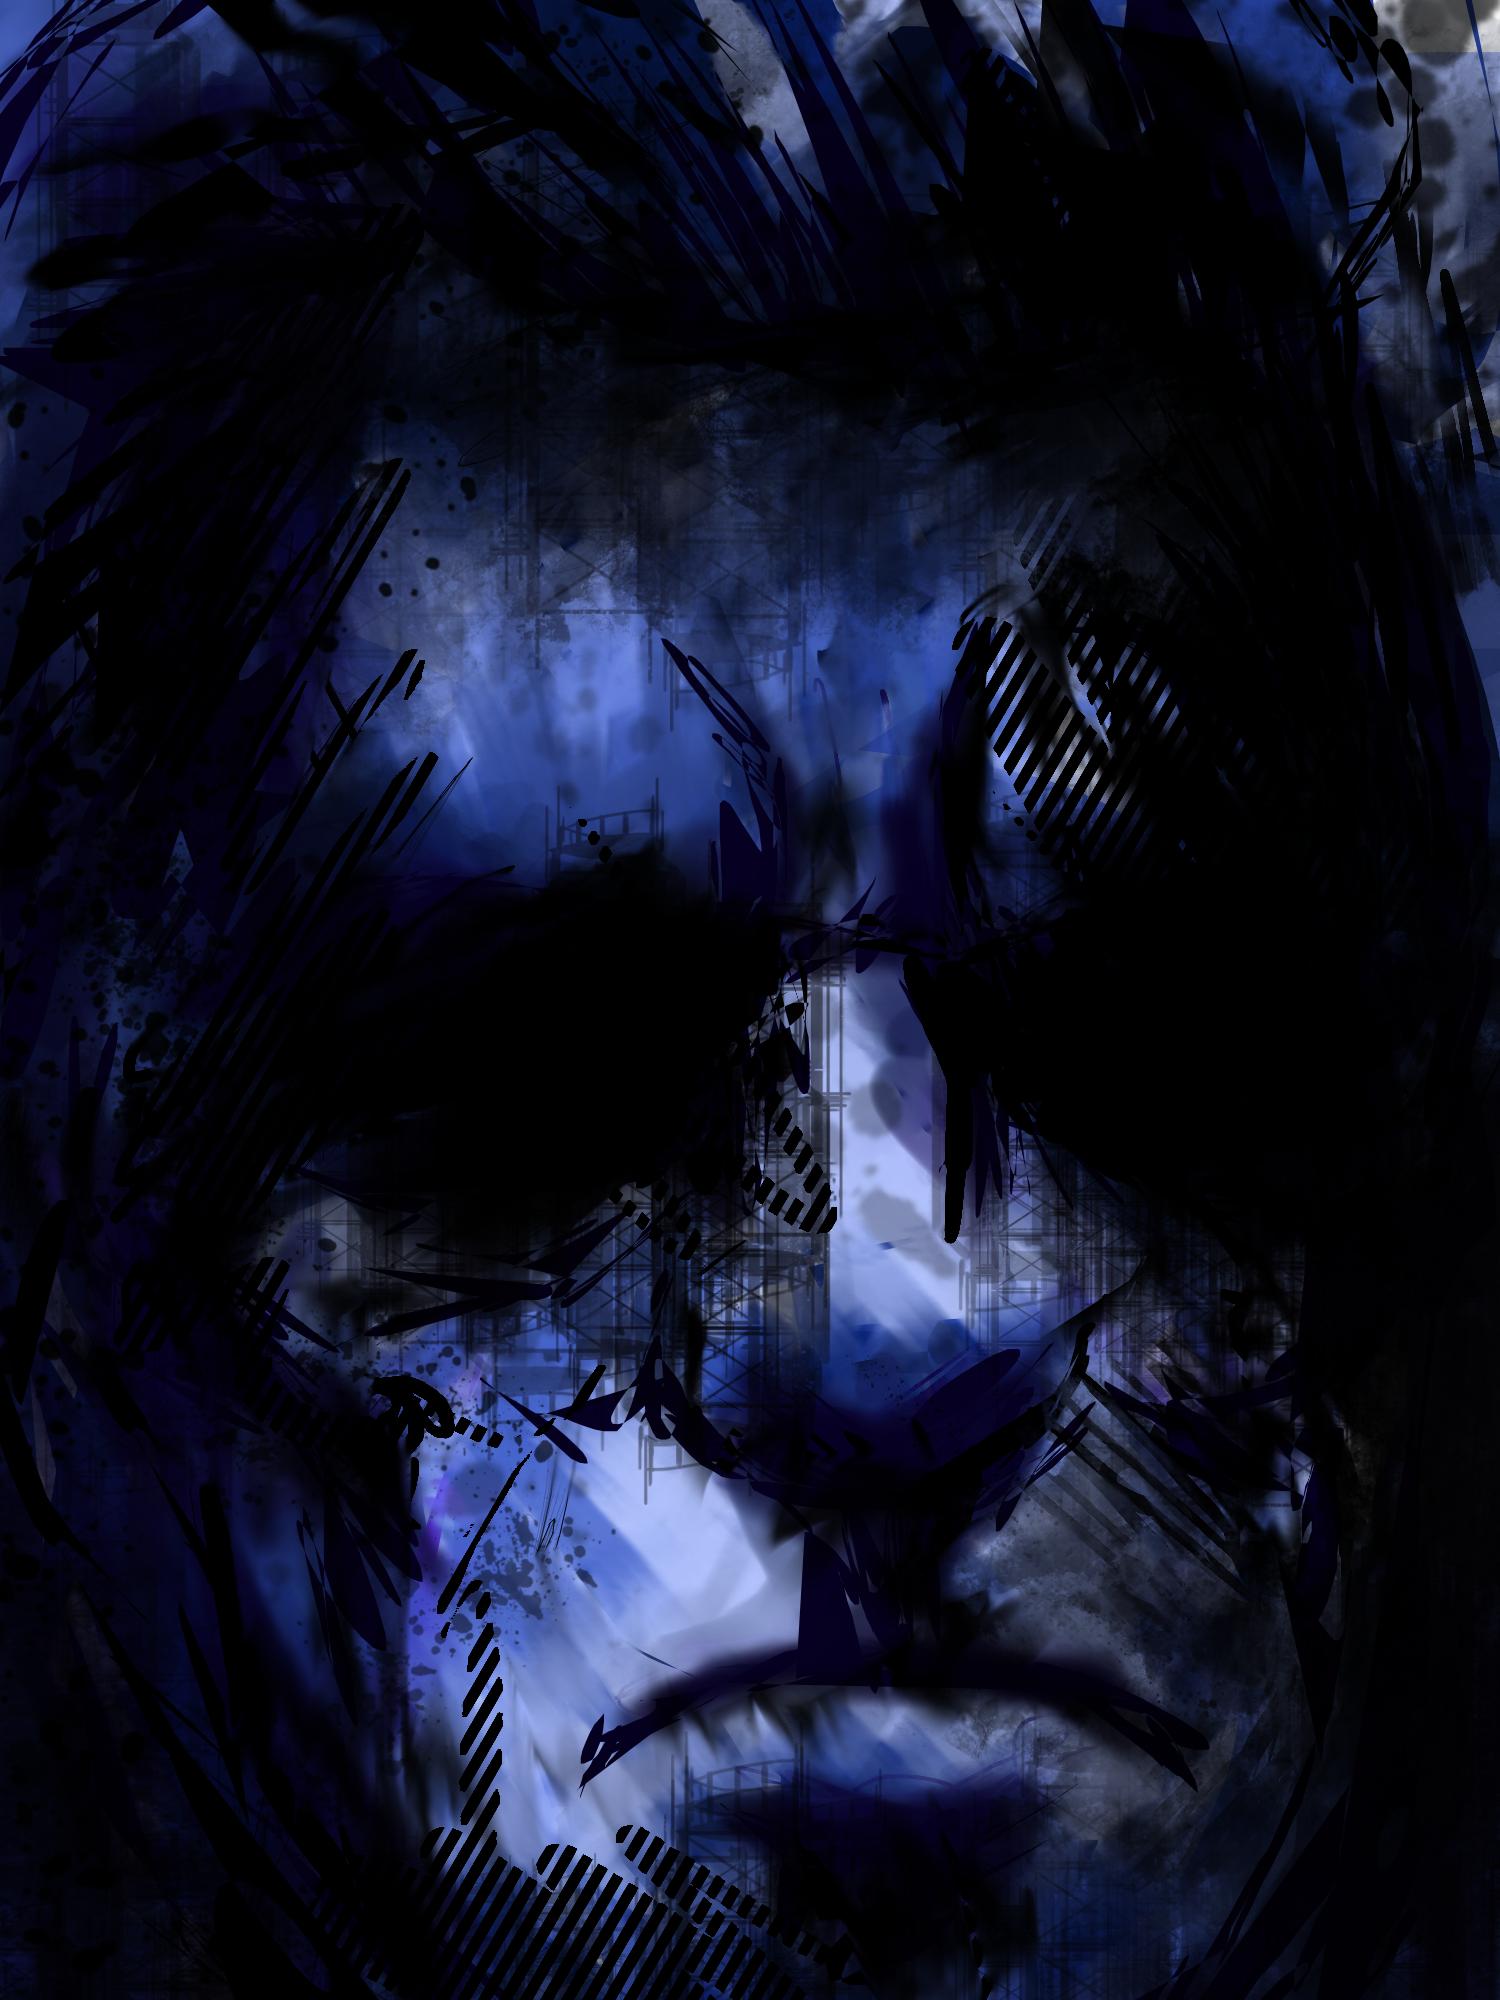 bluface